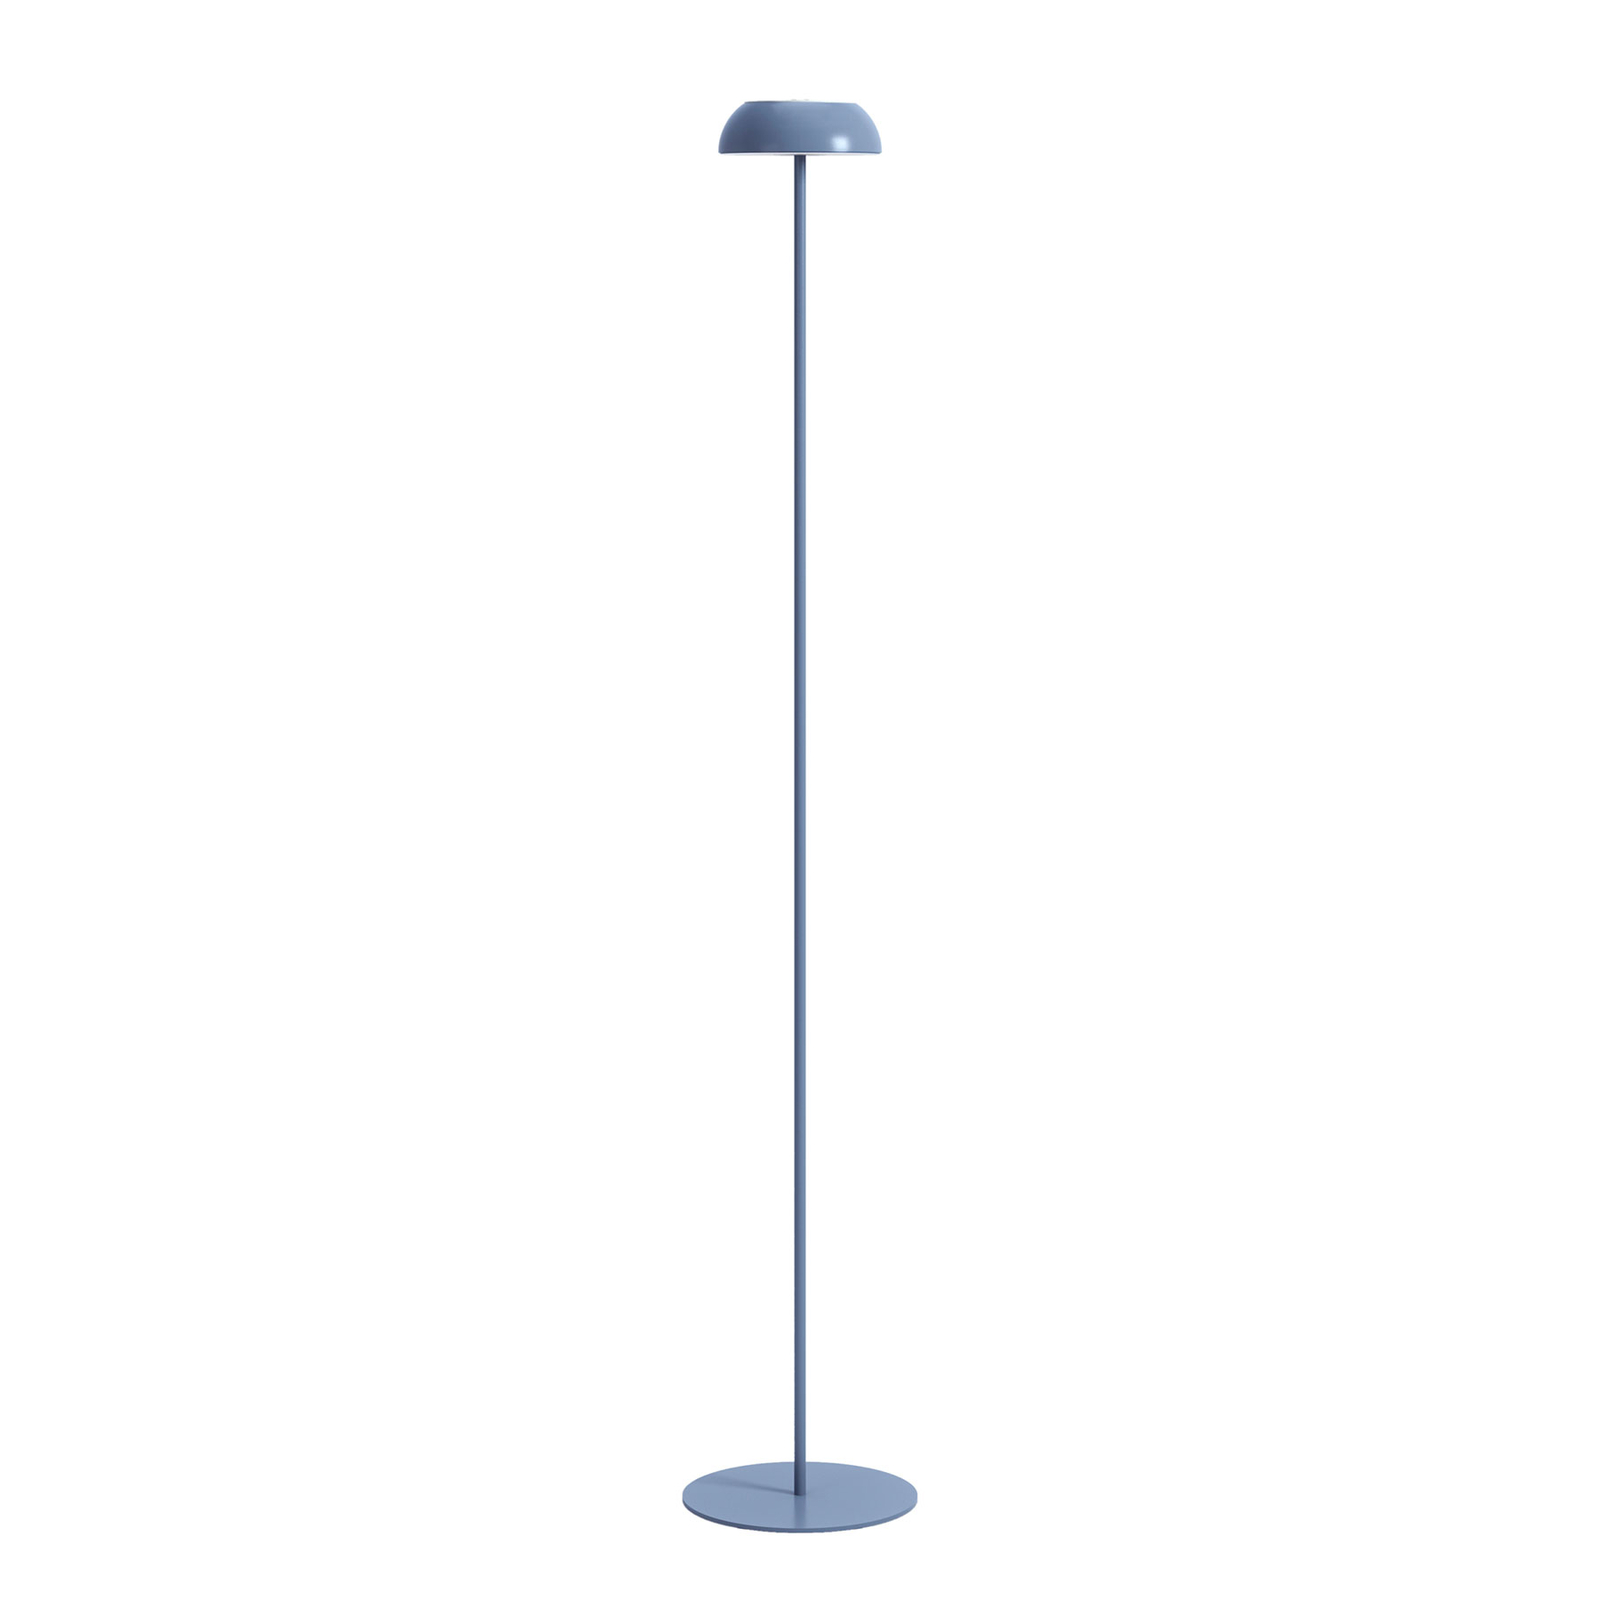 Axolight Float LED-Designer-Stehleuchte, blau